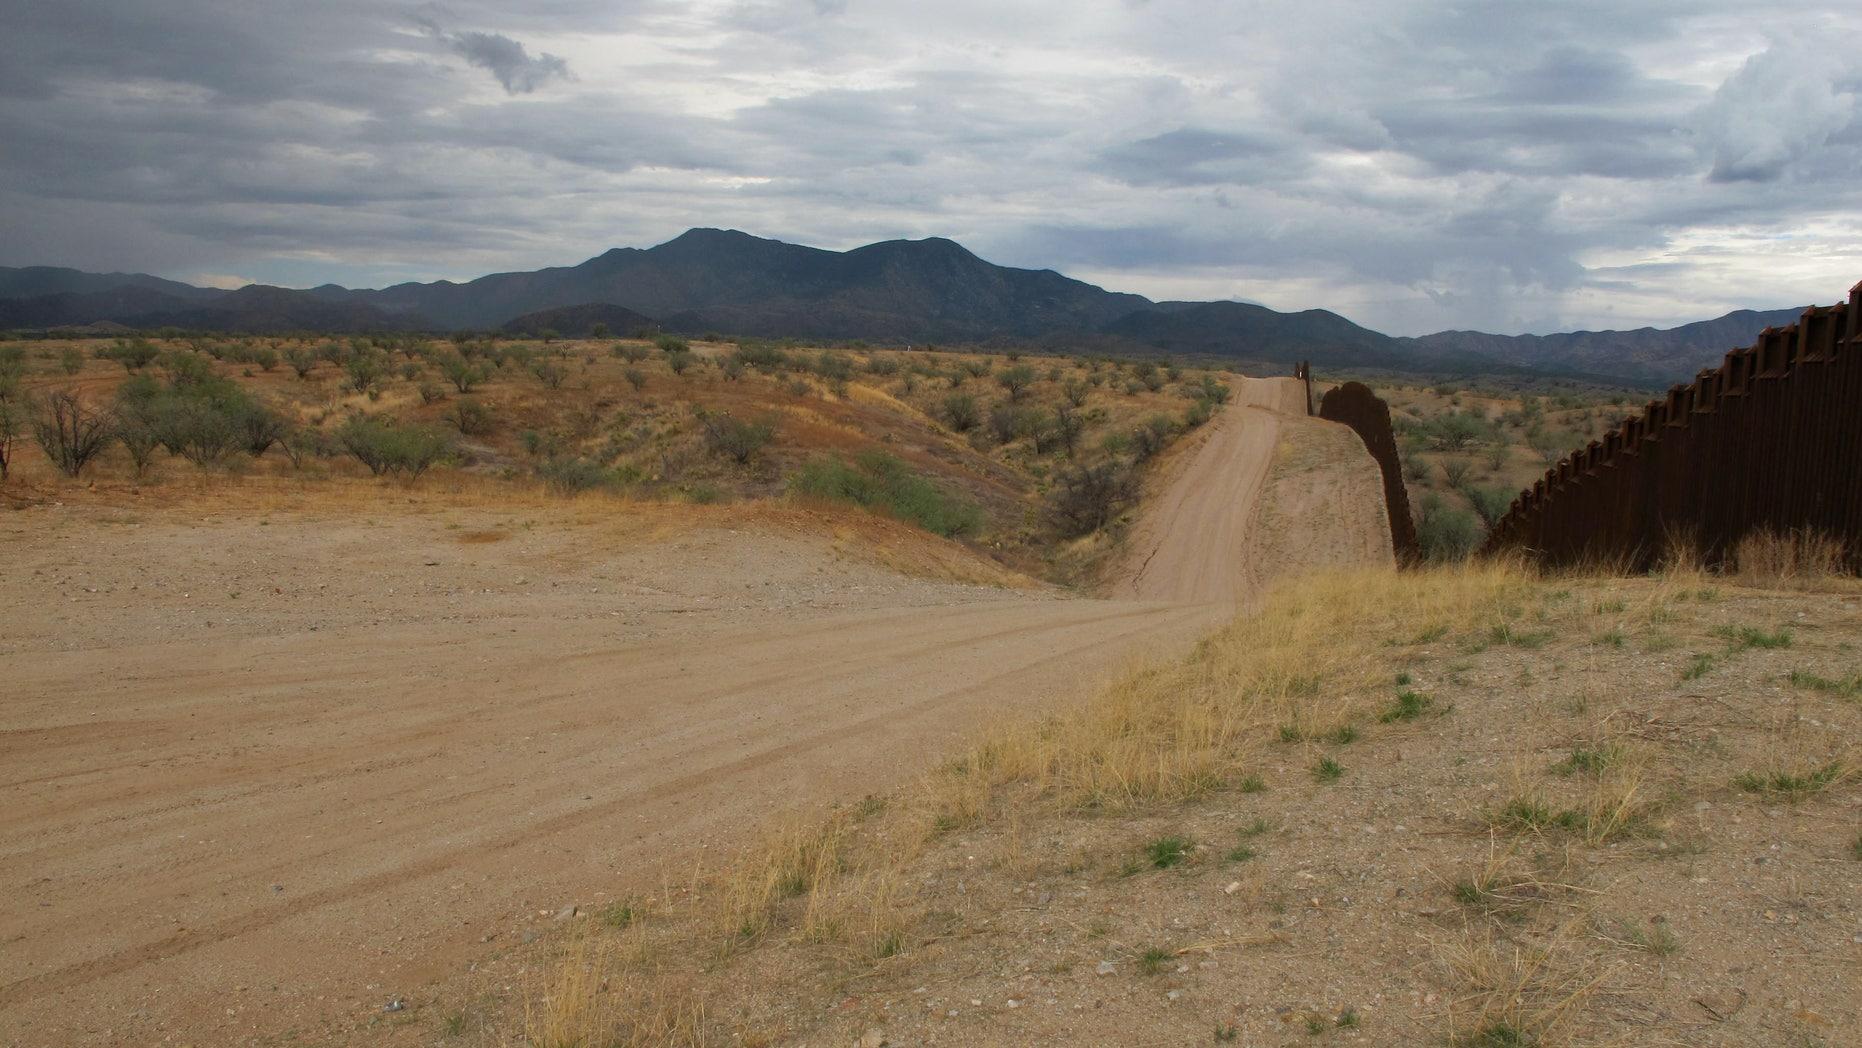 The U.S.-Mexico border fence in Santa Cruz County, AZ.